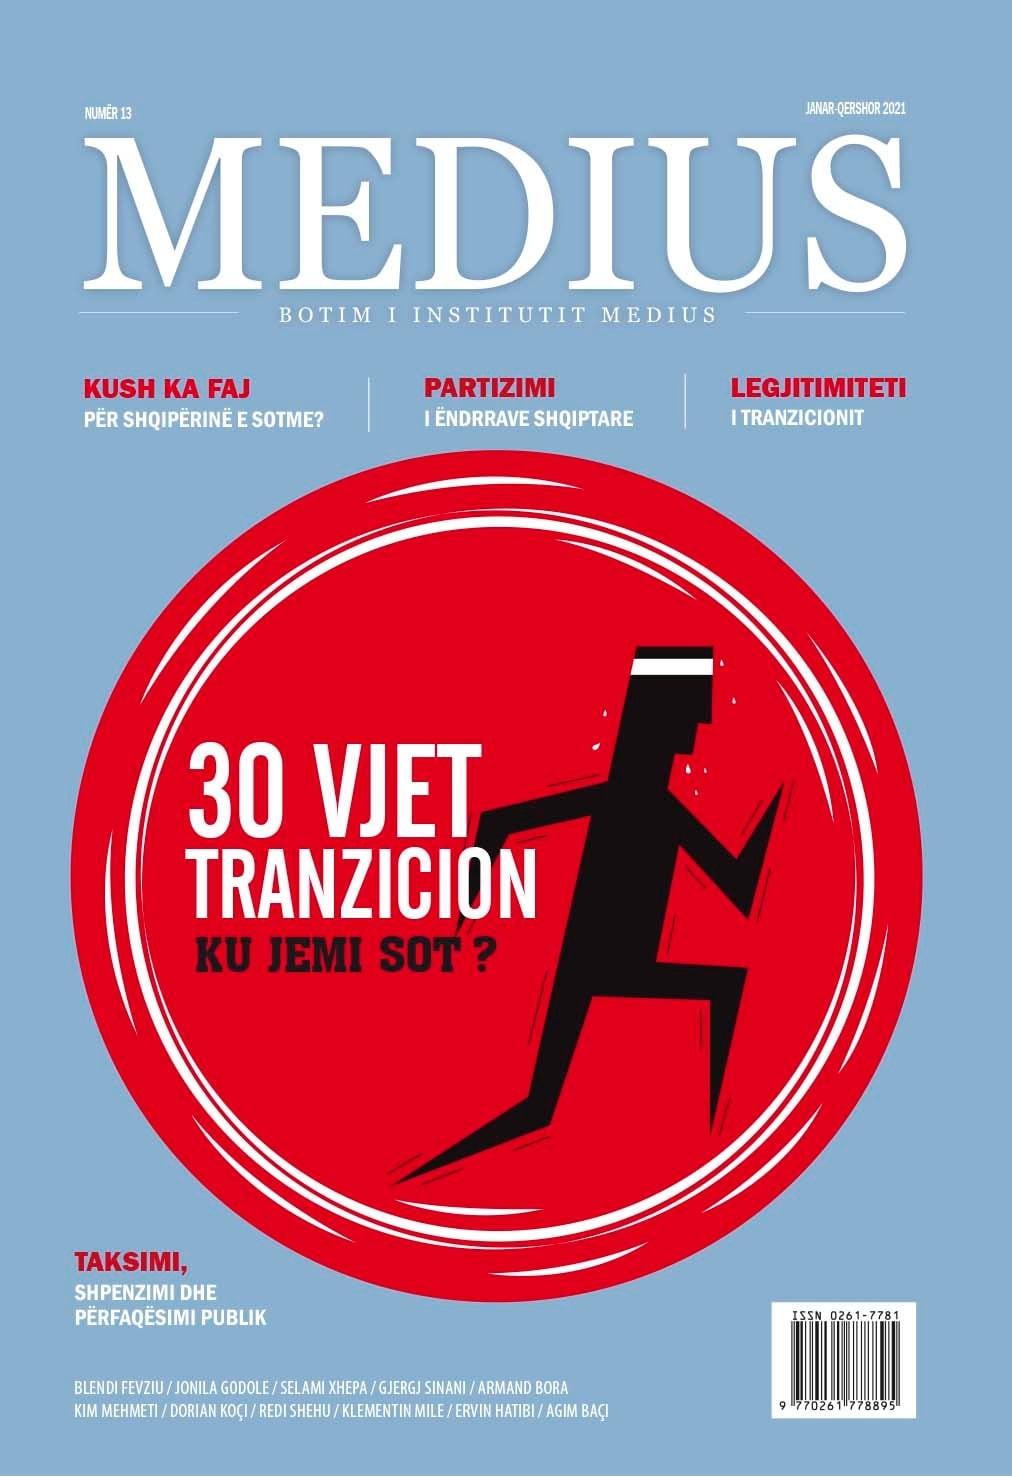 Medius nr. 13 - 30 vjet tranzicion, ku jemi sot